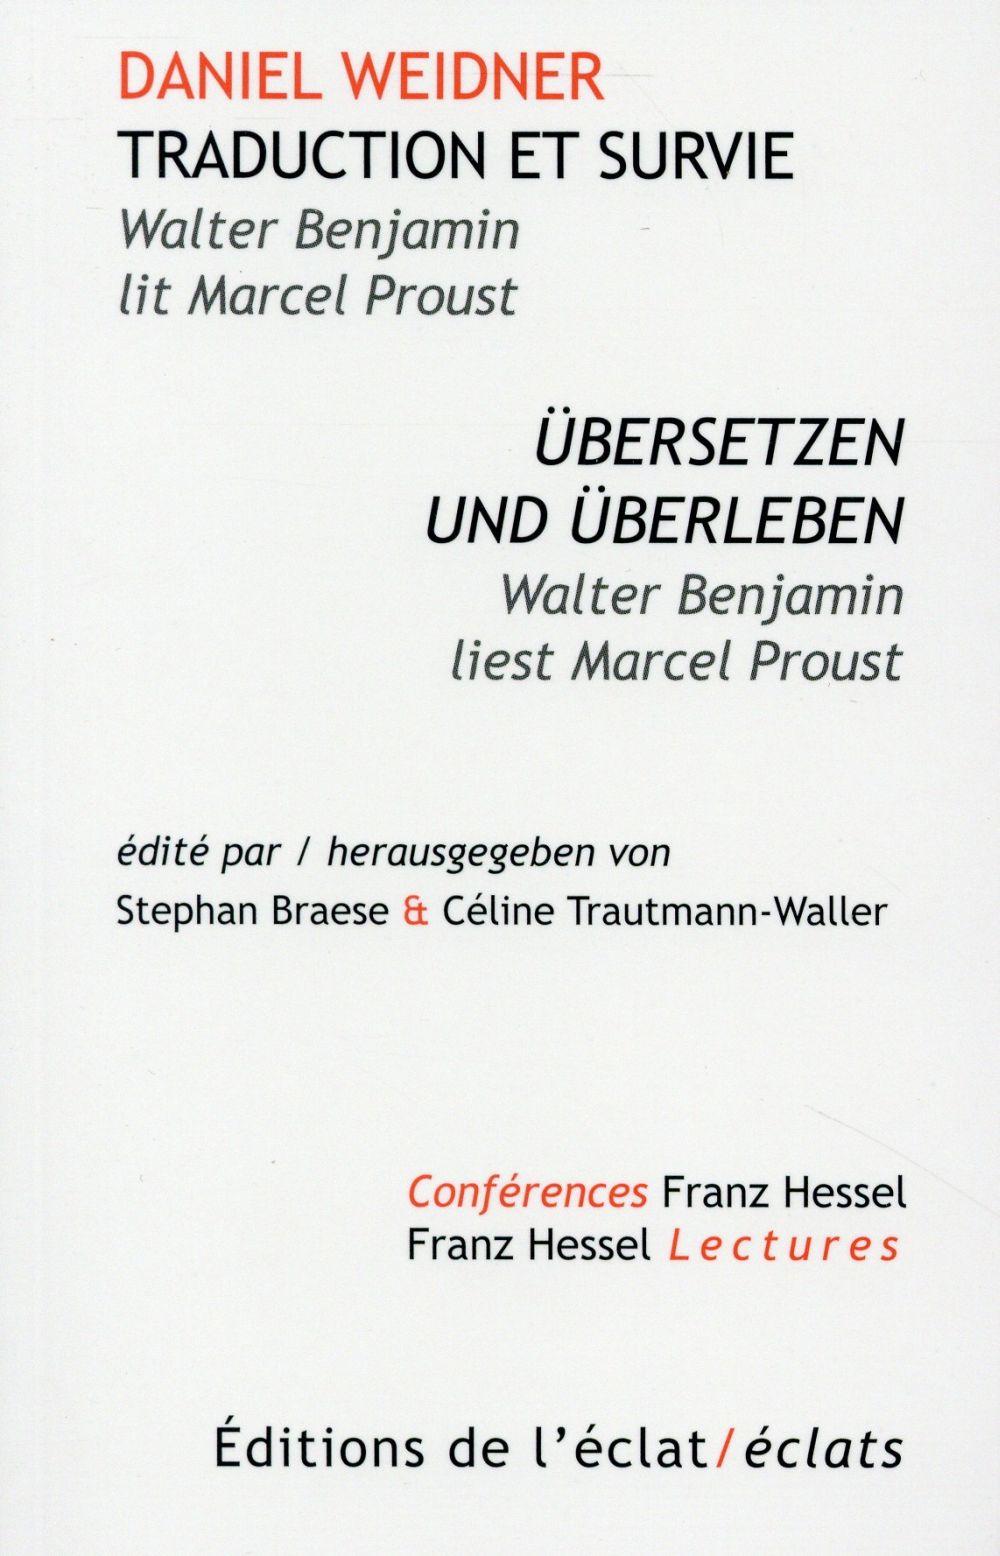 Traduction et survie ; Walter Benjamin lit Marcel Proust